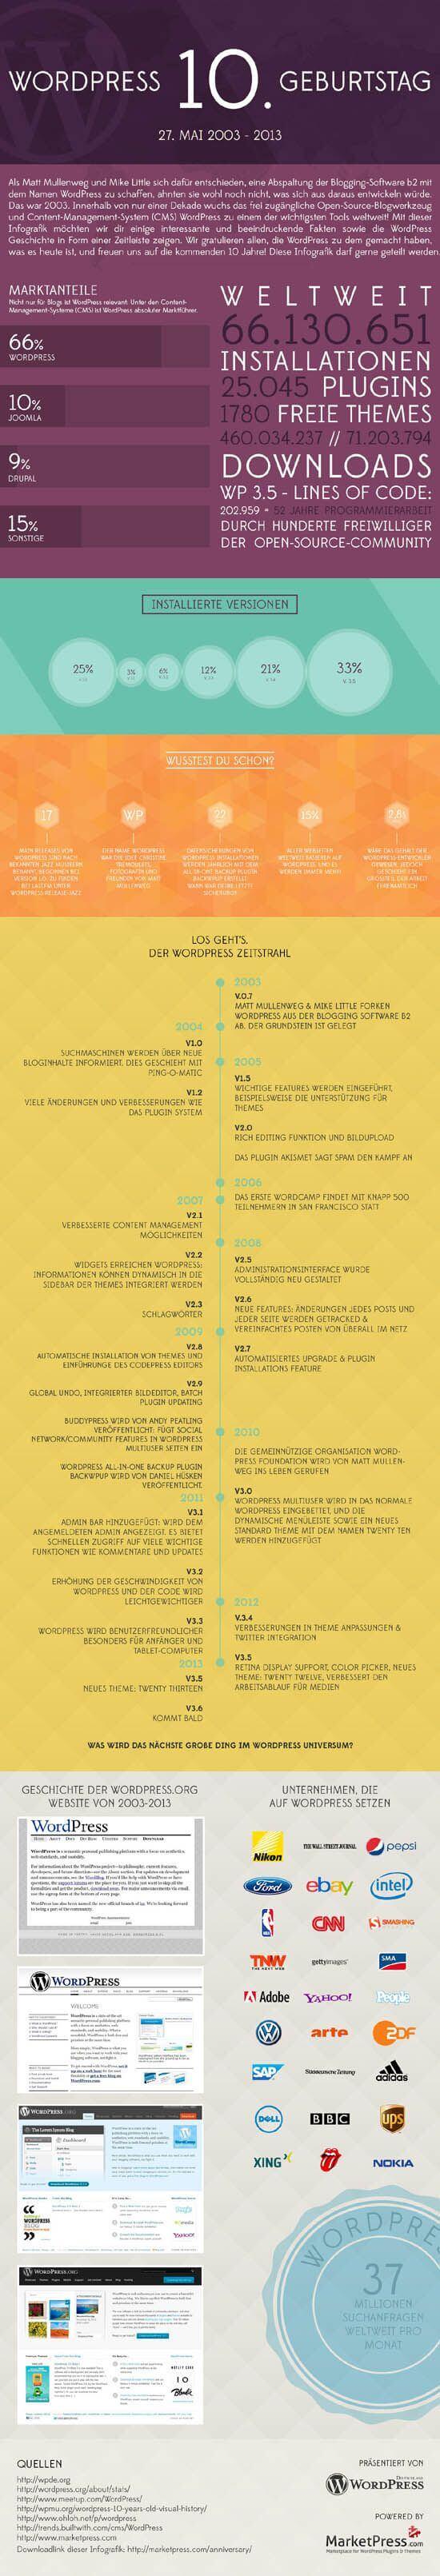 10jahrewordpress-infografik